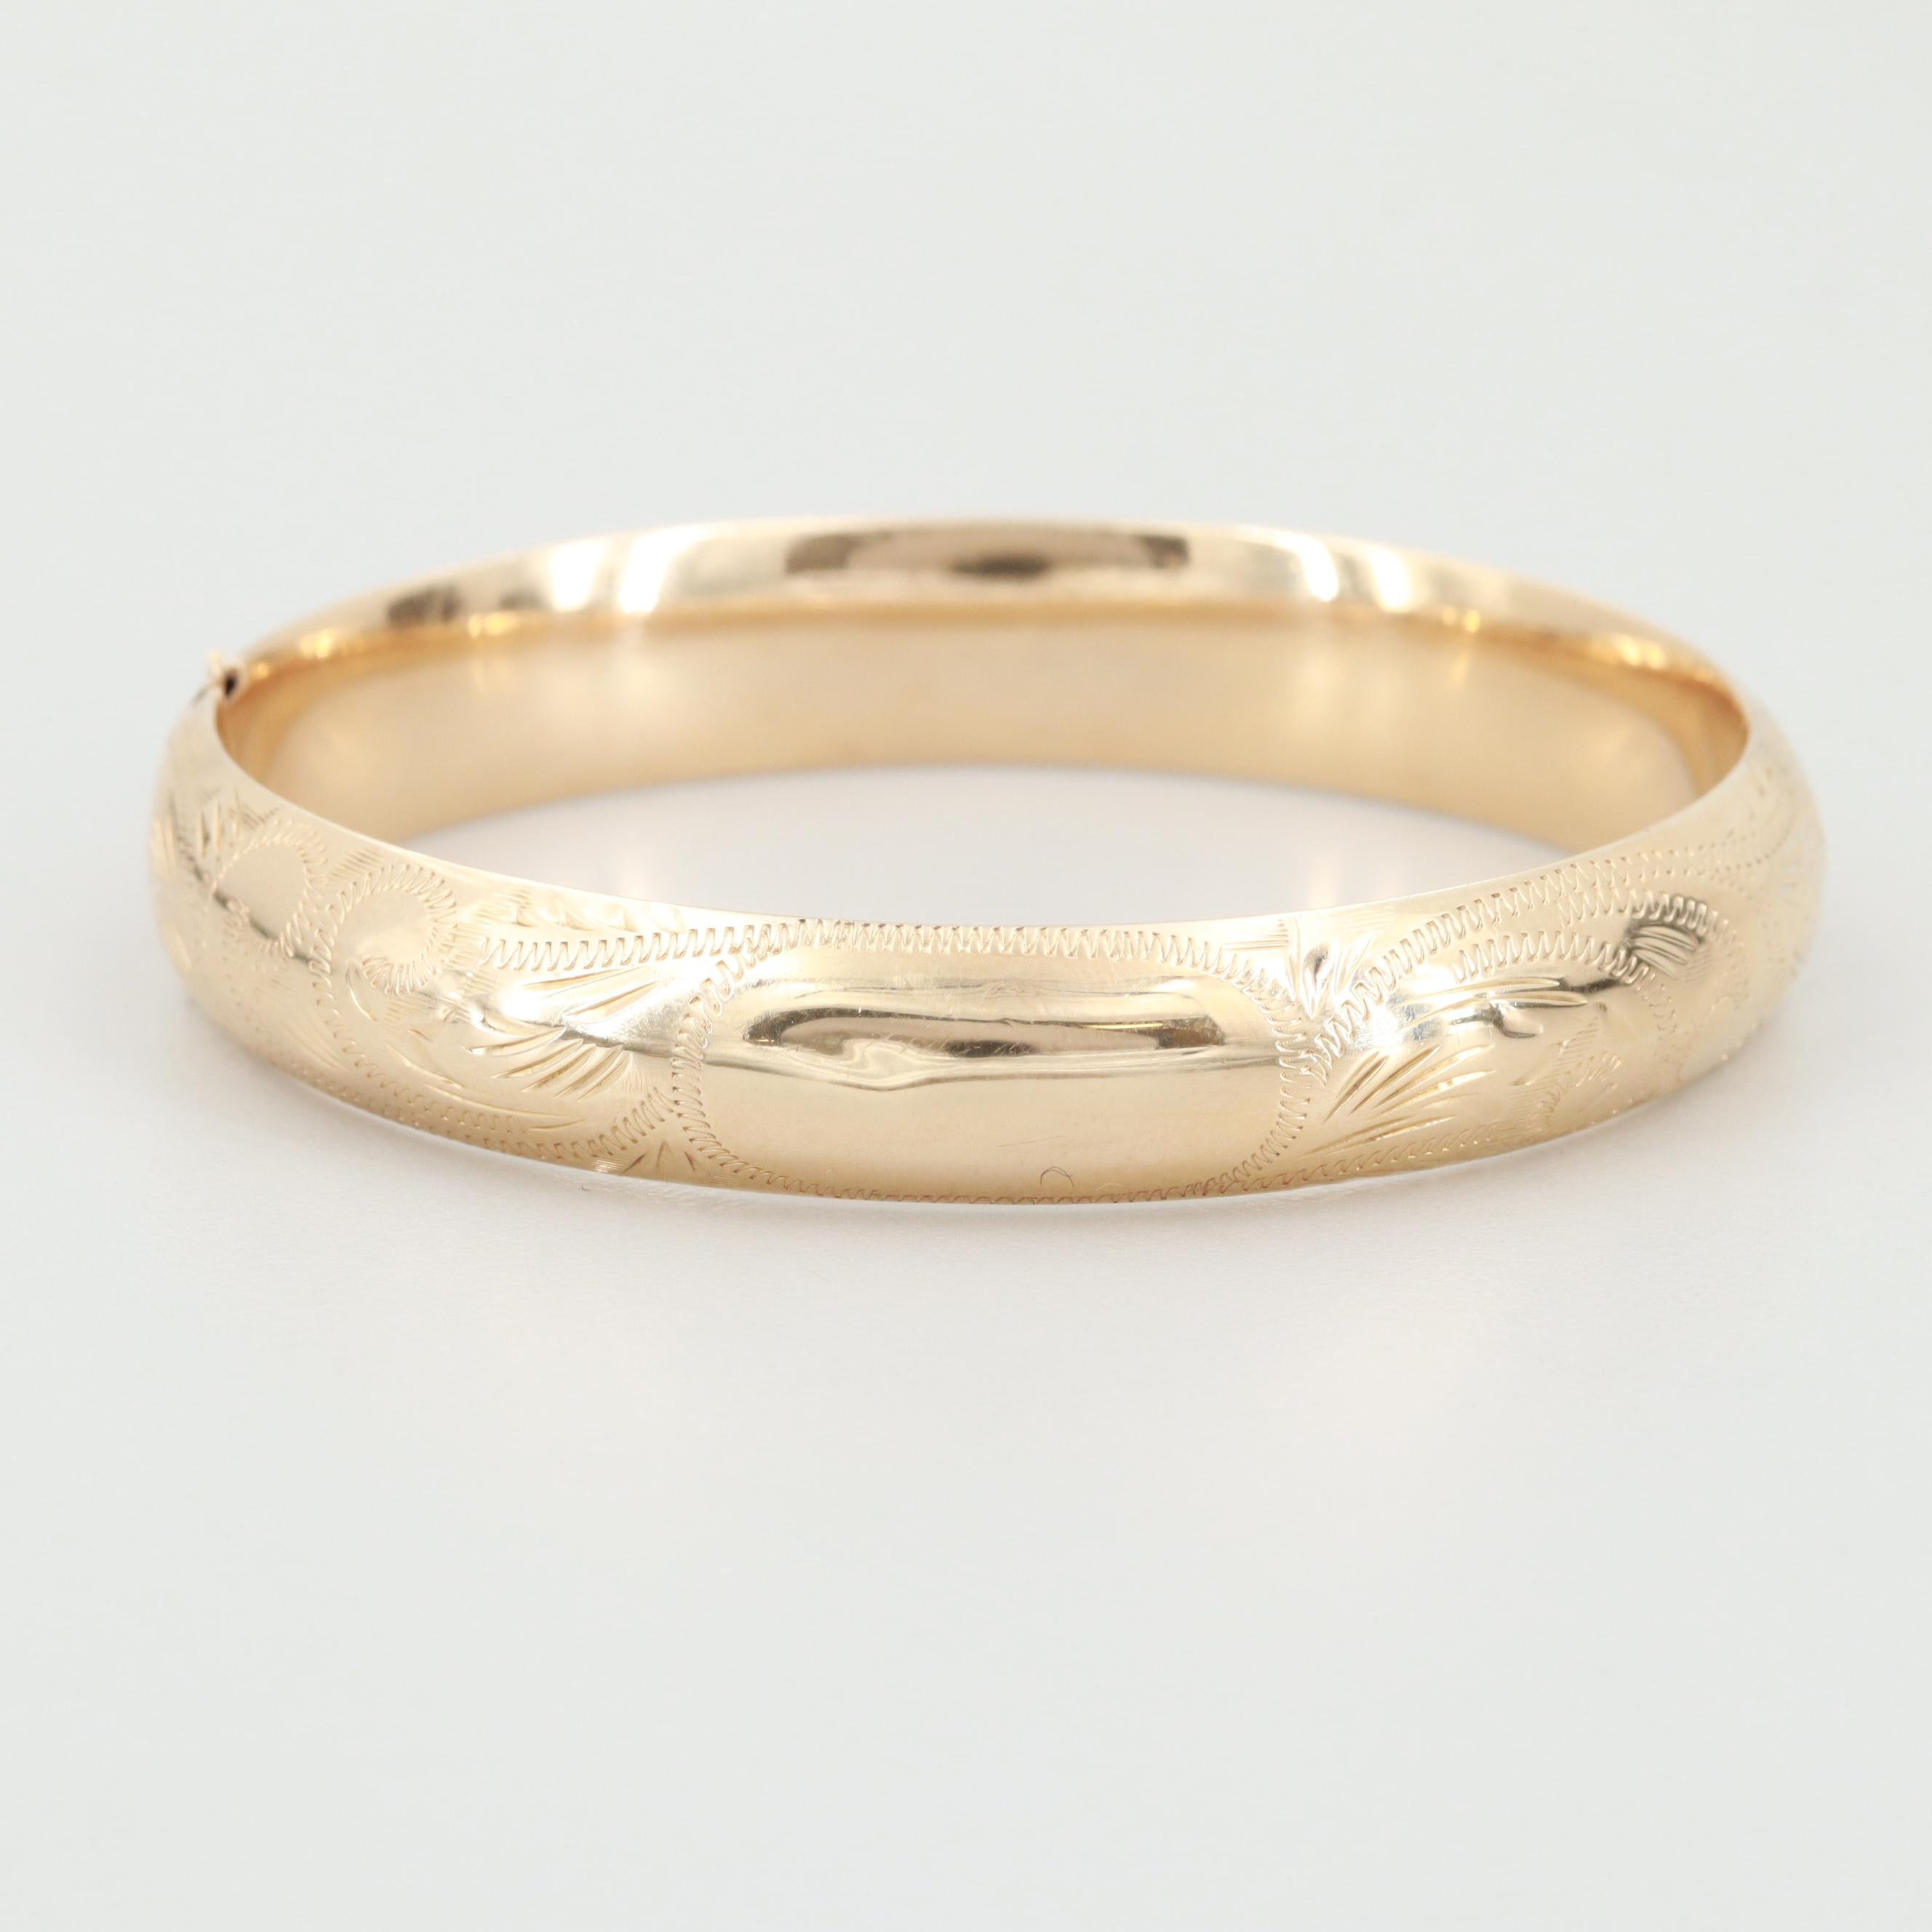 14K Yellow Gold Engraved Hinged Bangle Bracelet